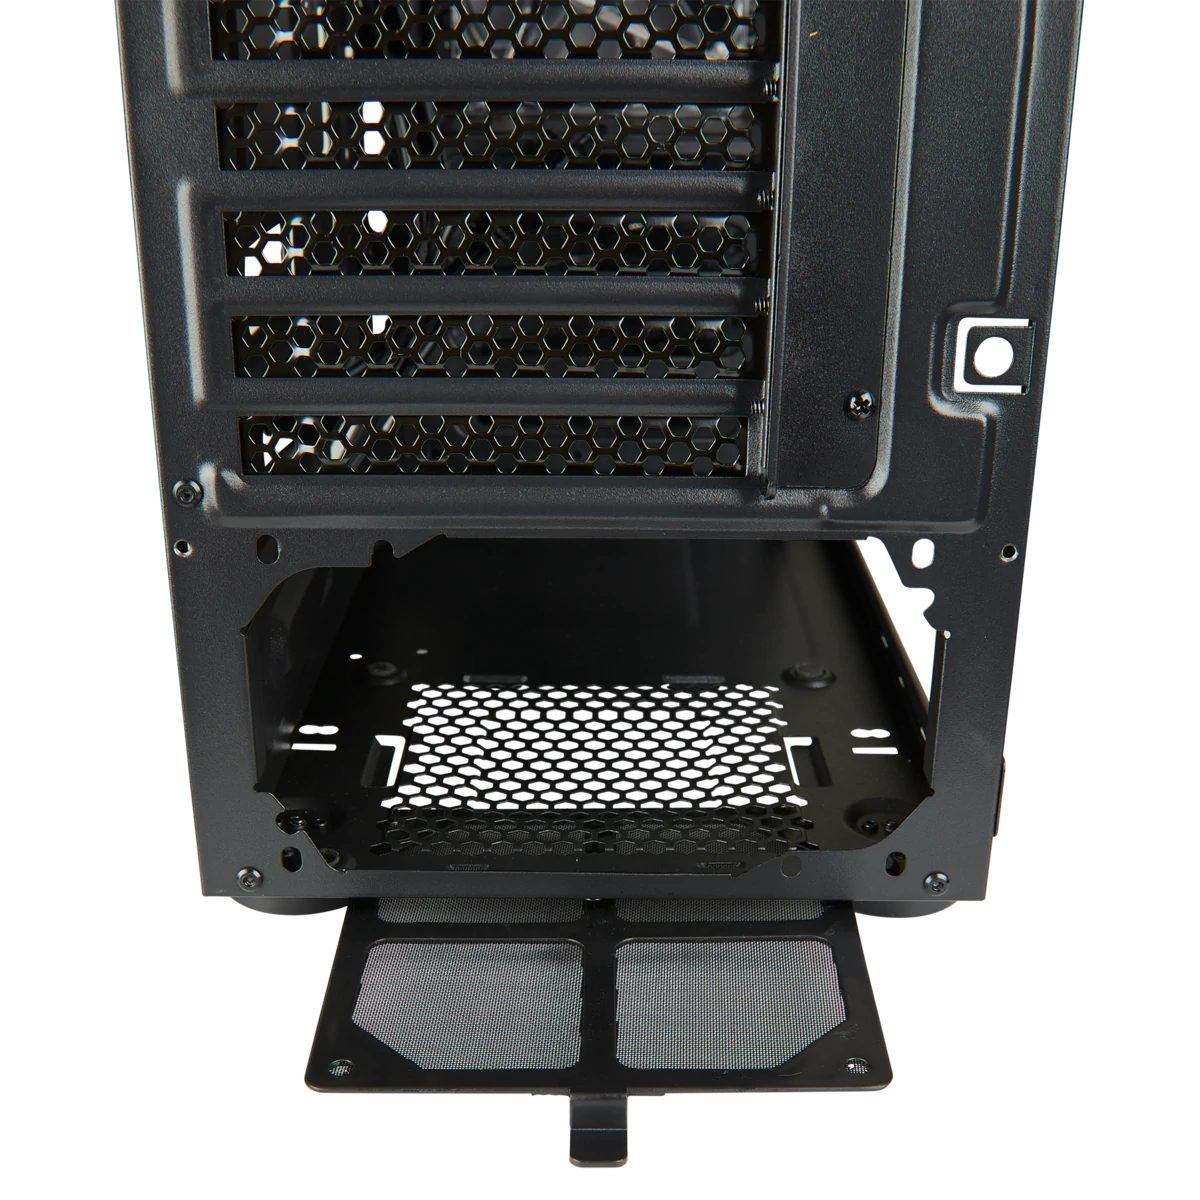 corsair-carbide-serisi-spec-05-550w-80-usb-3-0-siyah-mid-tower-kasa